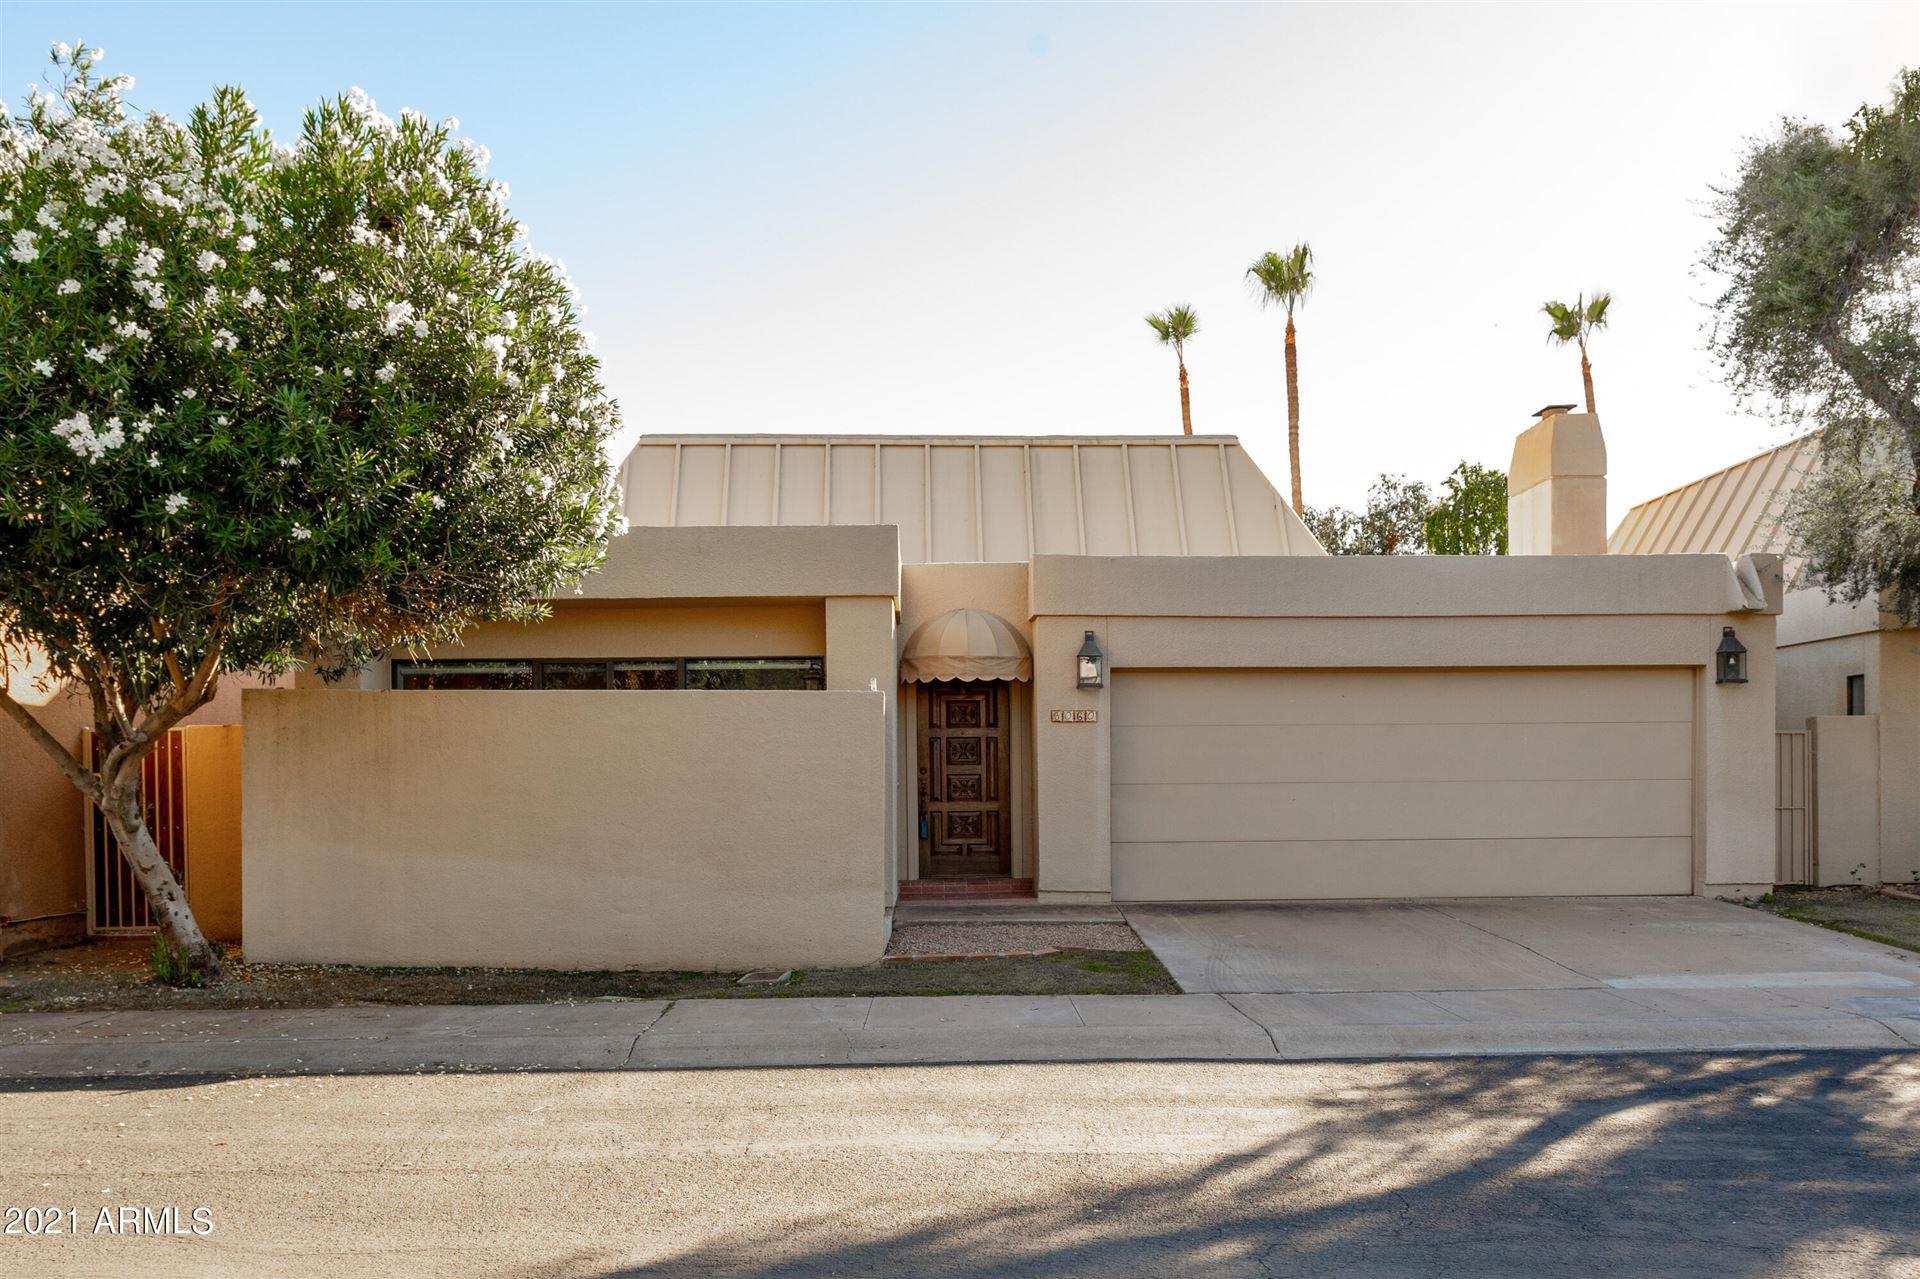 5060 N 25th Place, Phoenix, AZ 85016 - MLS#: 6228588